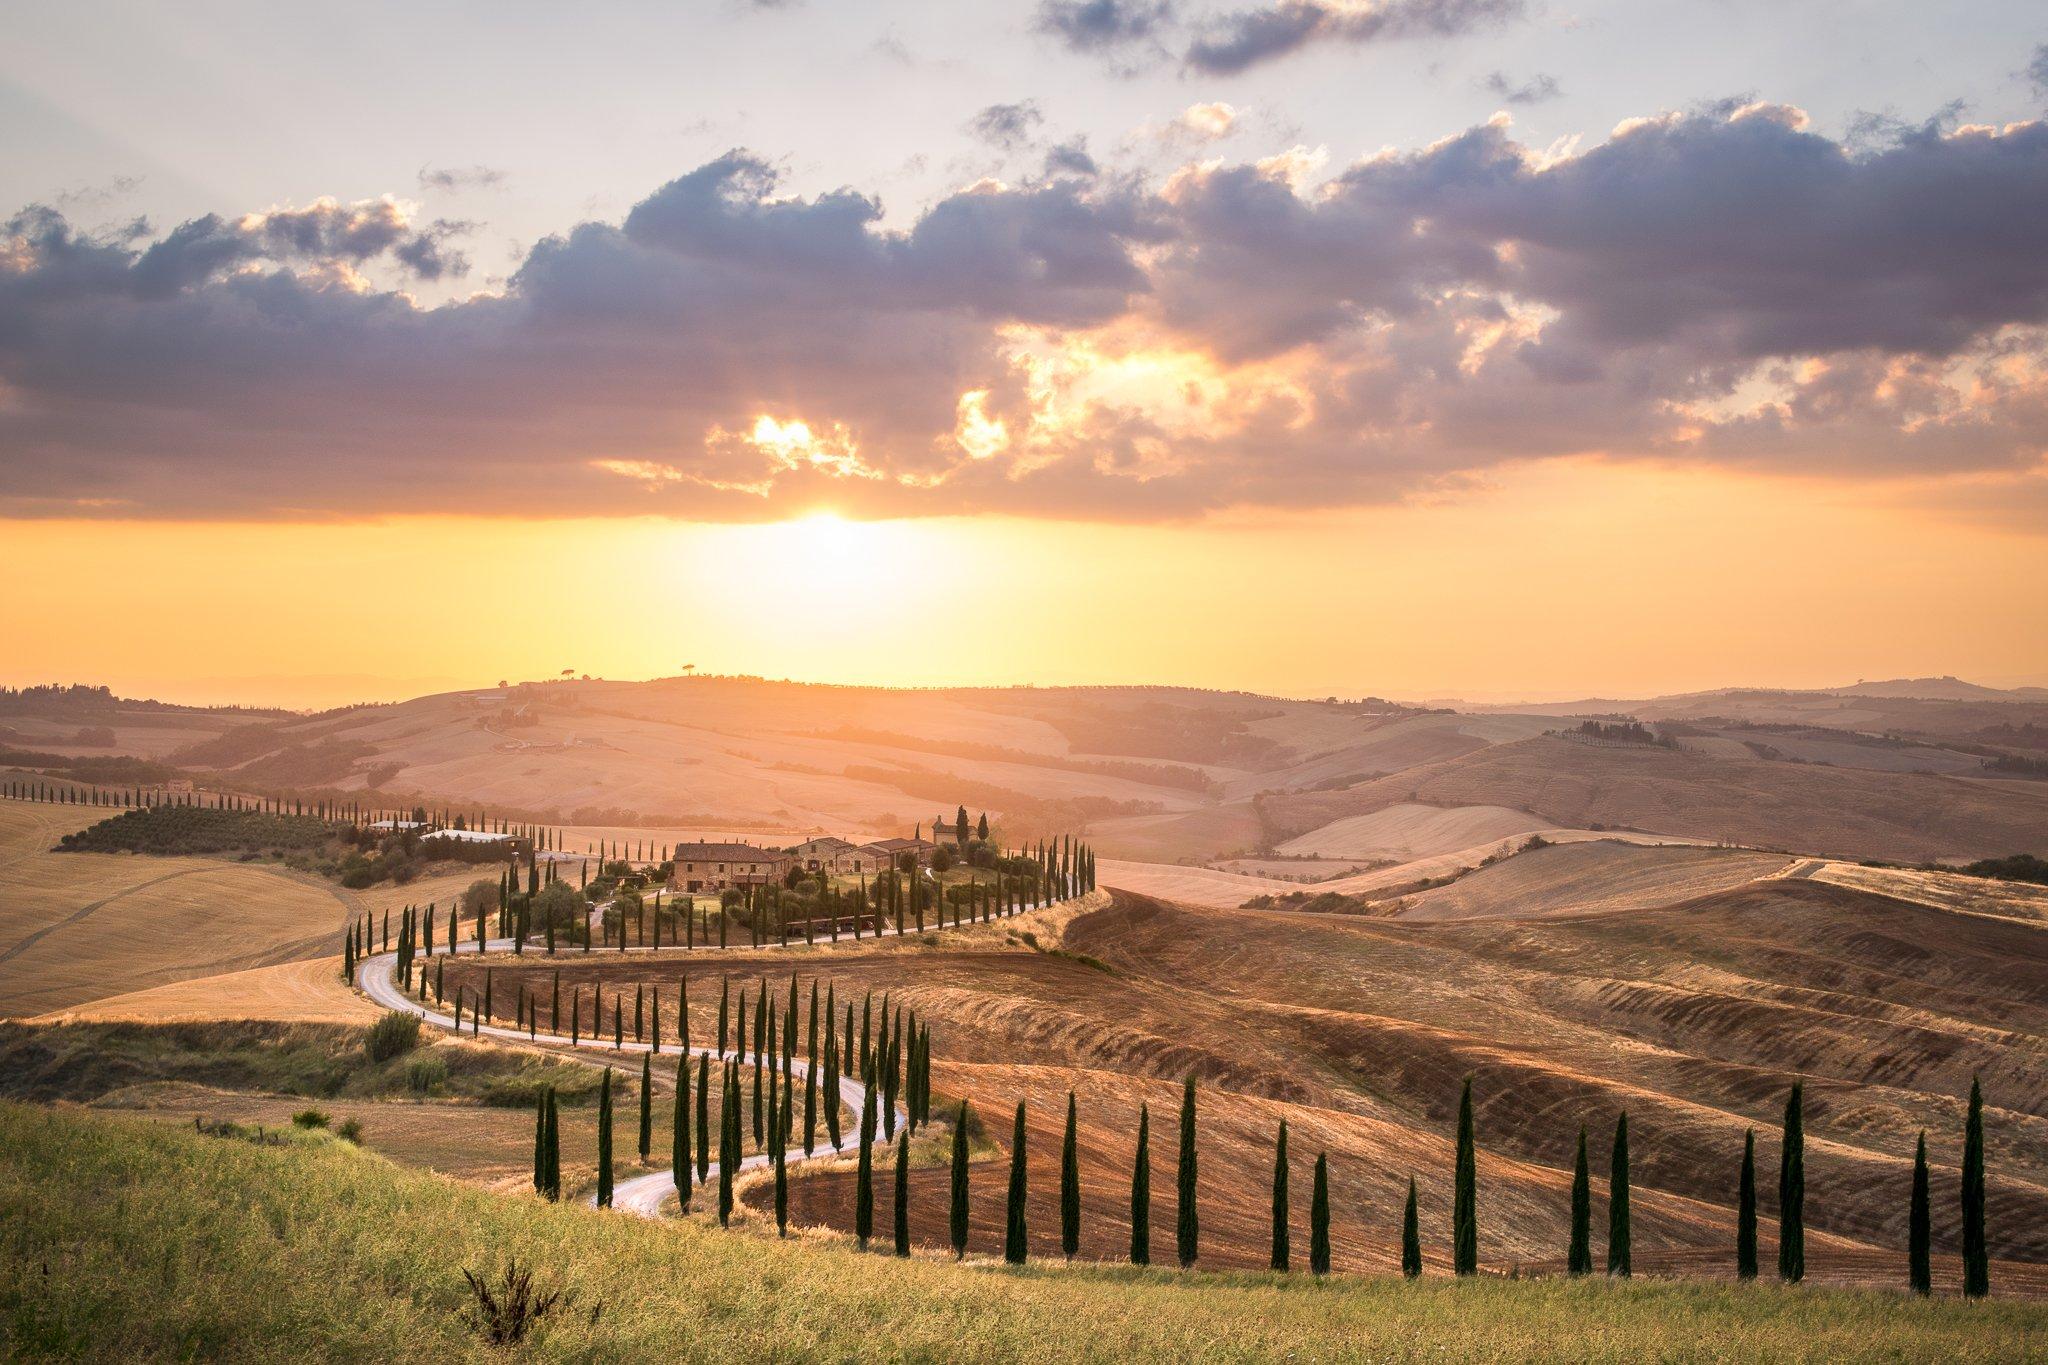 #sunset #tuscany #wine #summer #travel #journey, Mая Врънгова